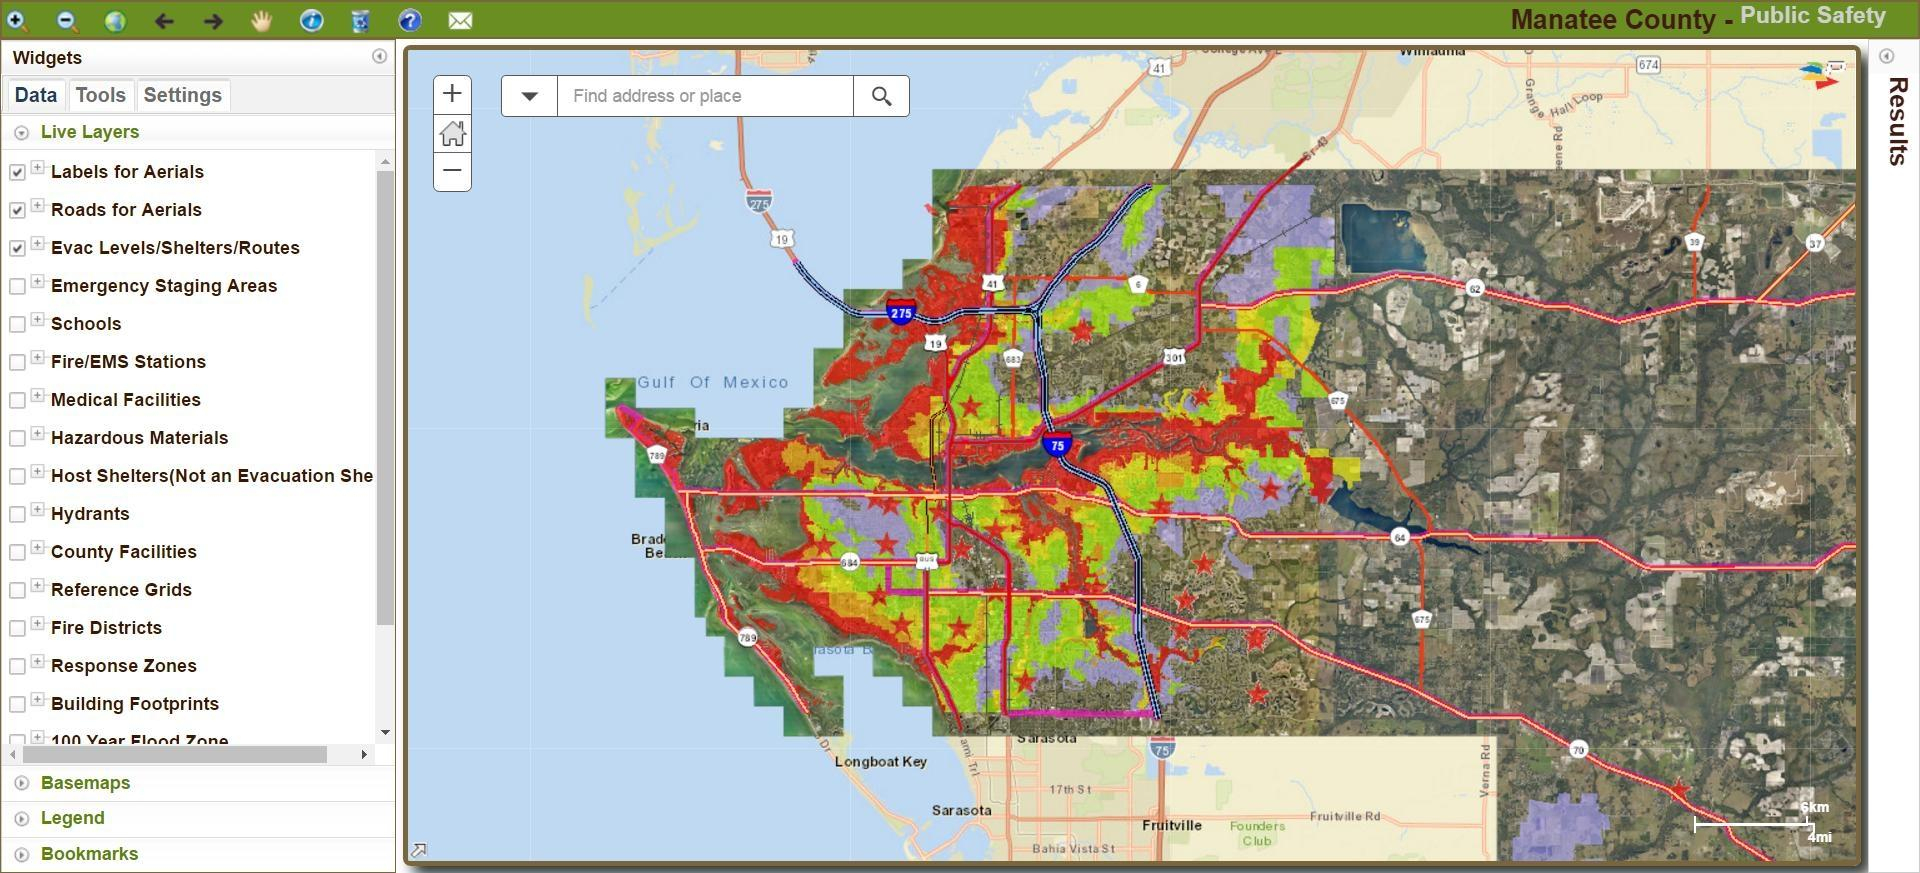 Manatee County Updates Hurricane Storm Surge Maps - Sarasota Florida Flood Zone Map